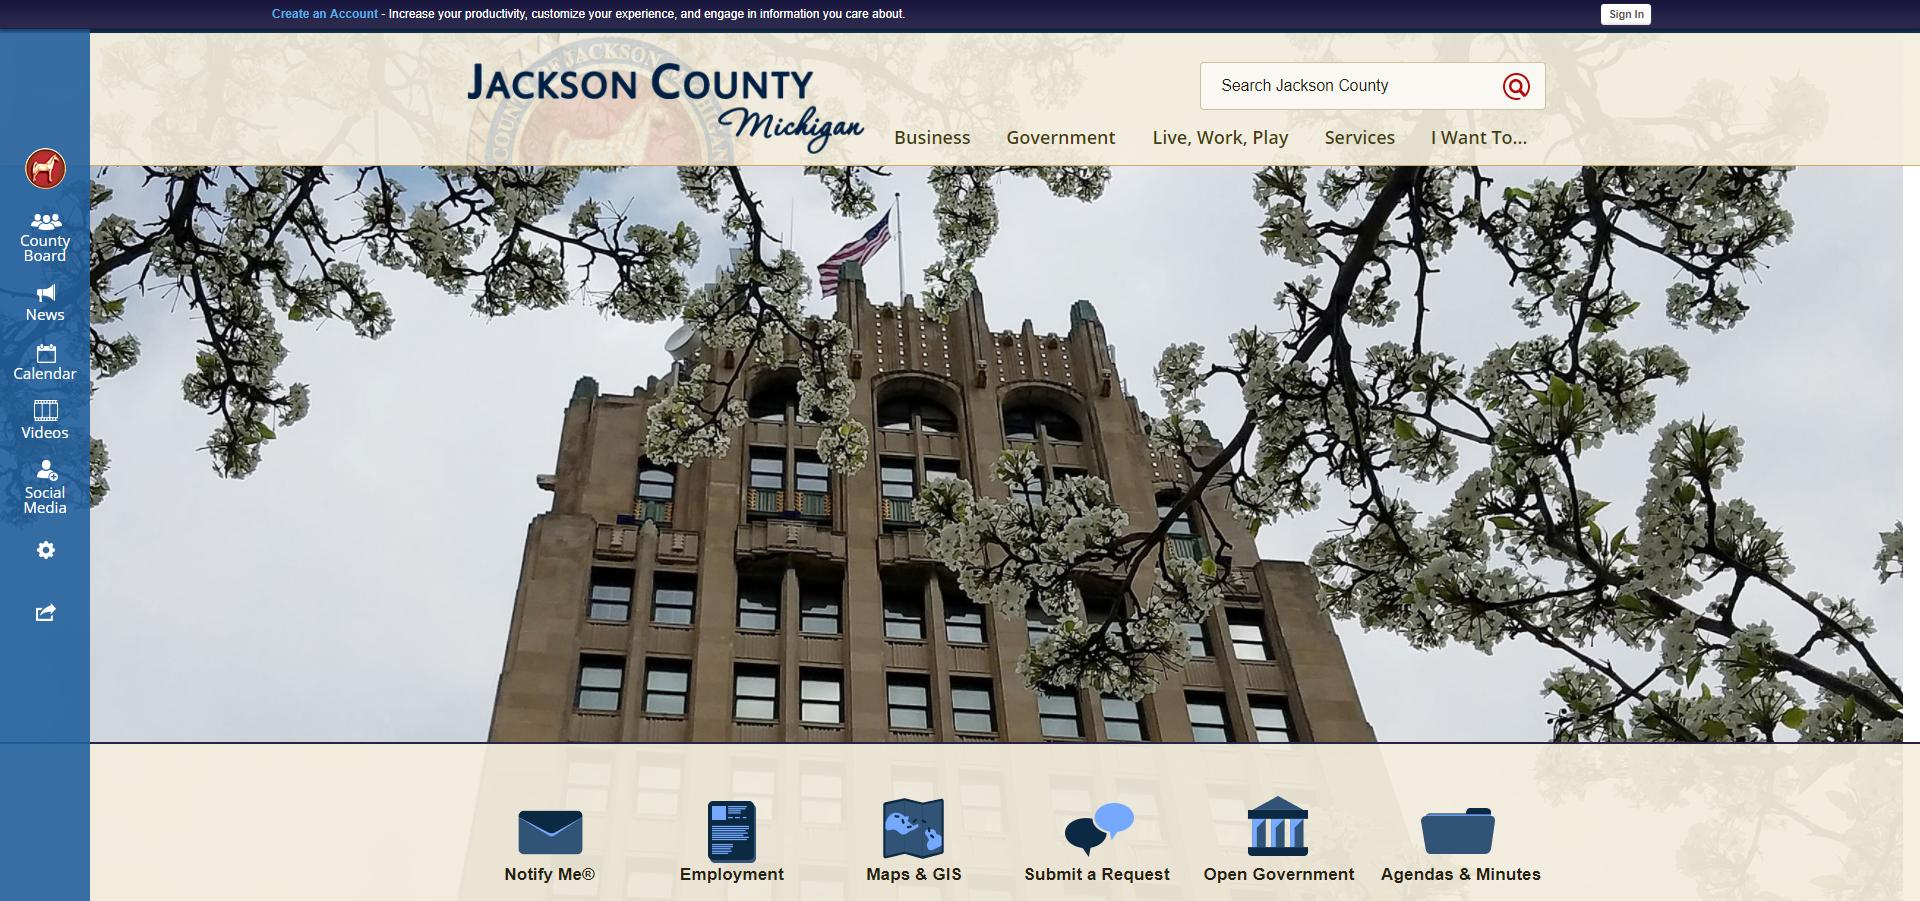 2017_Digital_Counties_Award_Winner_CivicPlus_Jackson_County_MI.png